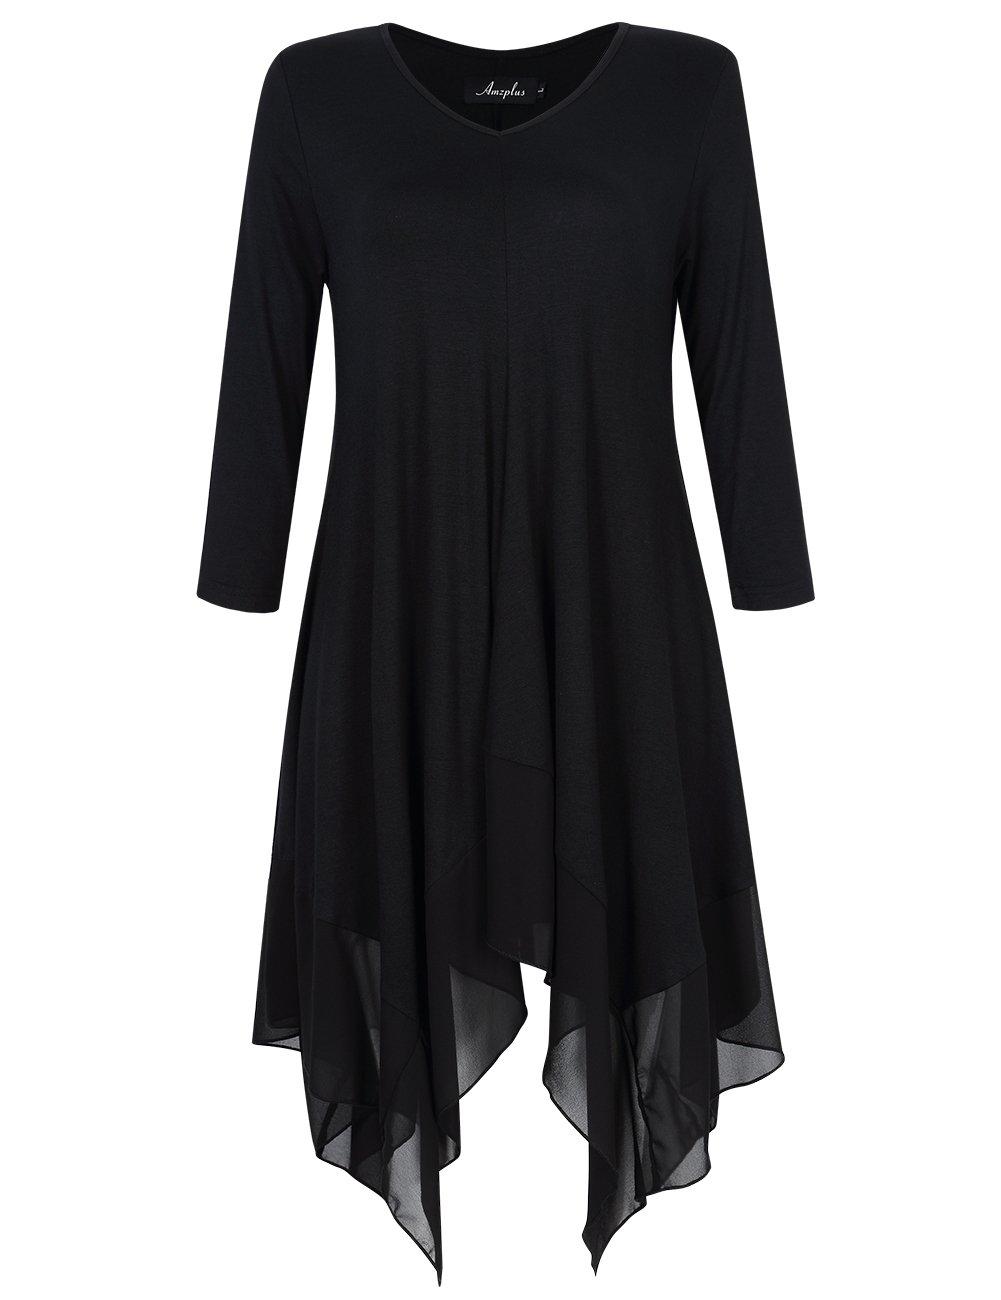 AMZ PLUS Womens Plus Size Irregular Hem Long Sleeve Loose Shirt Dress Top Black 2XL